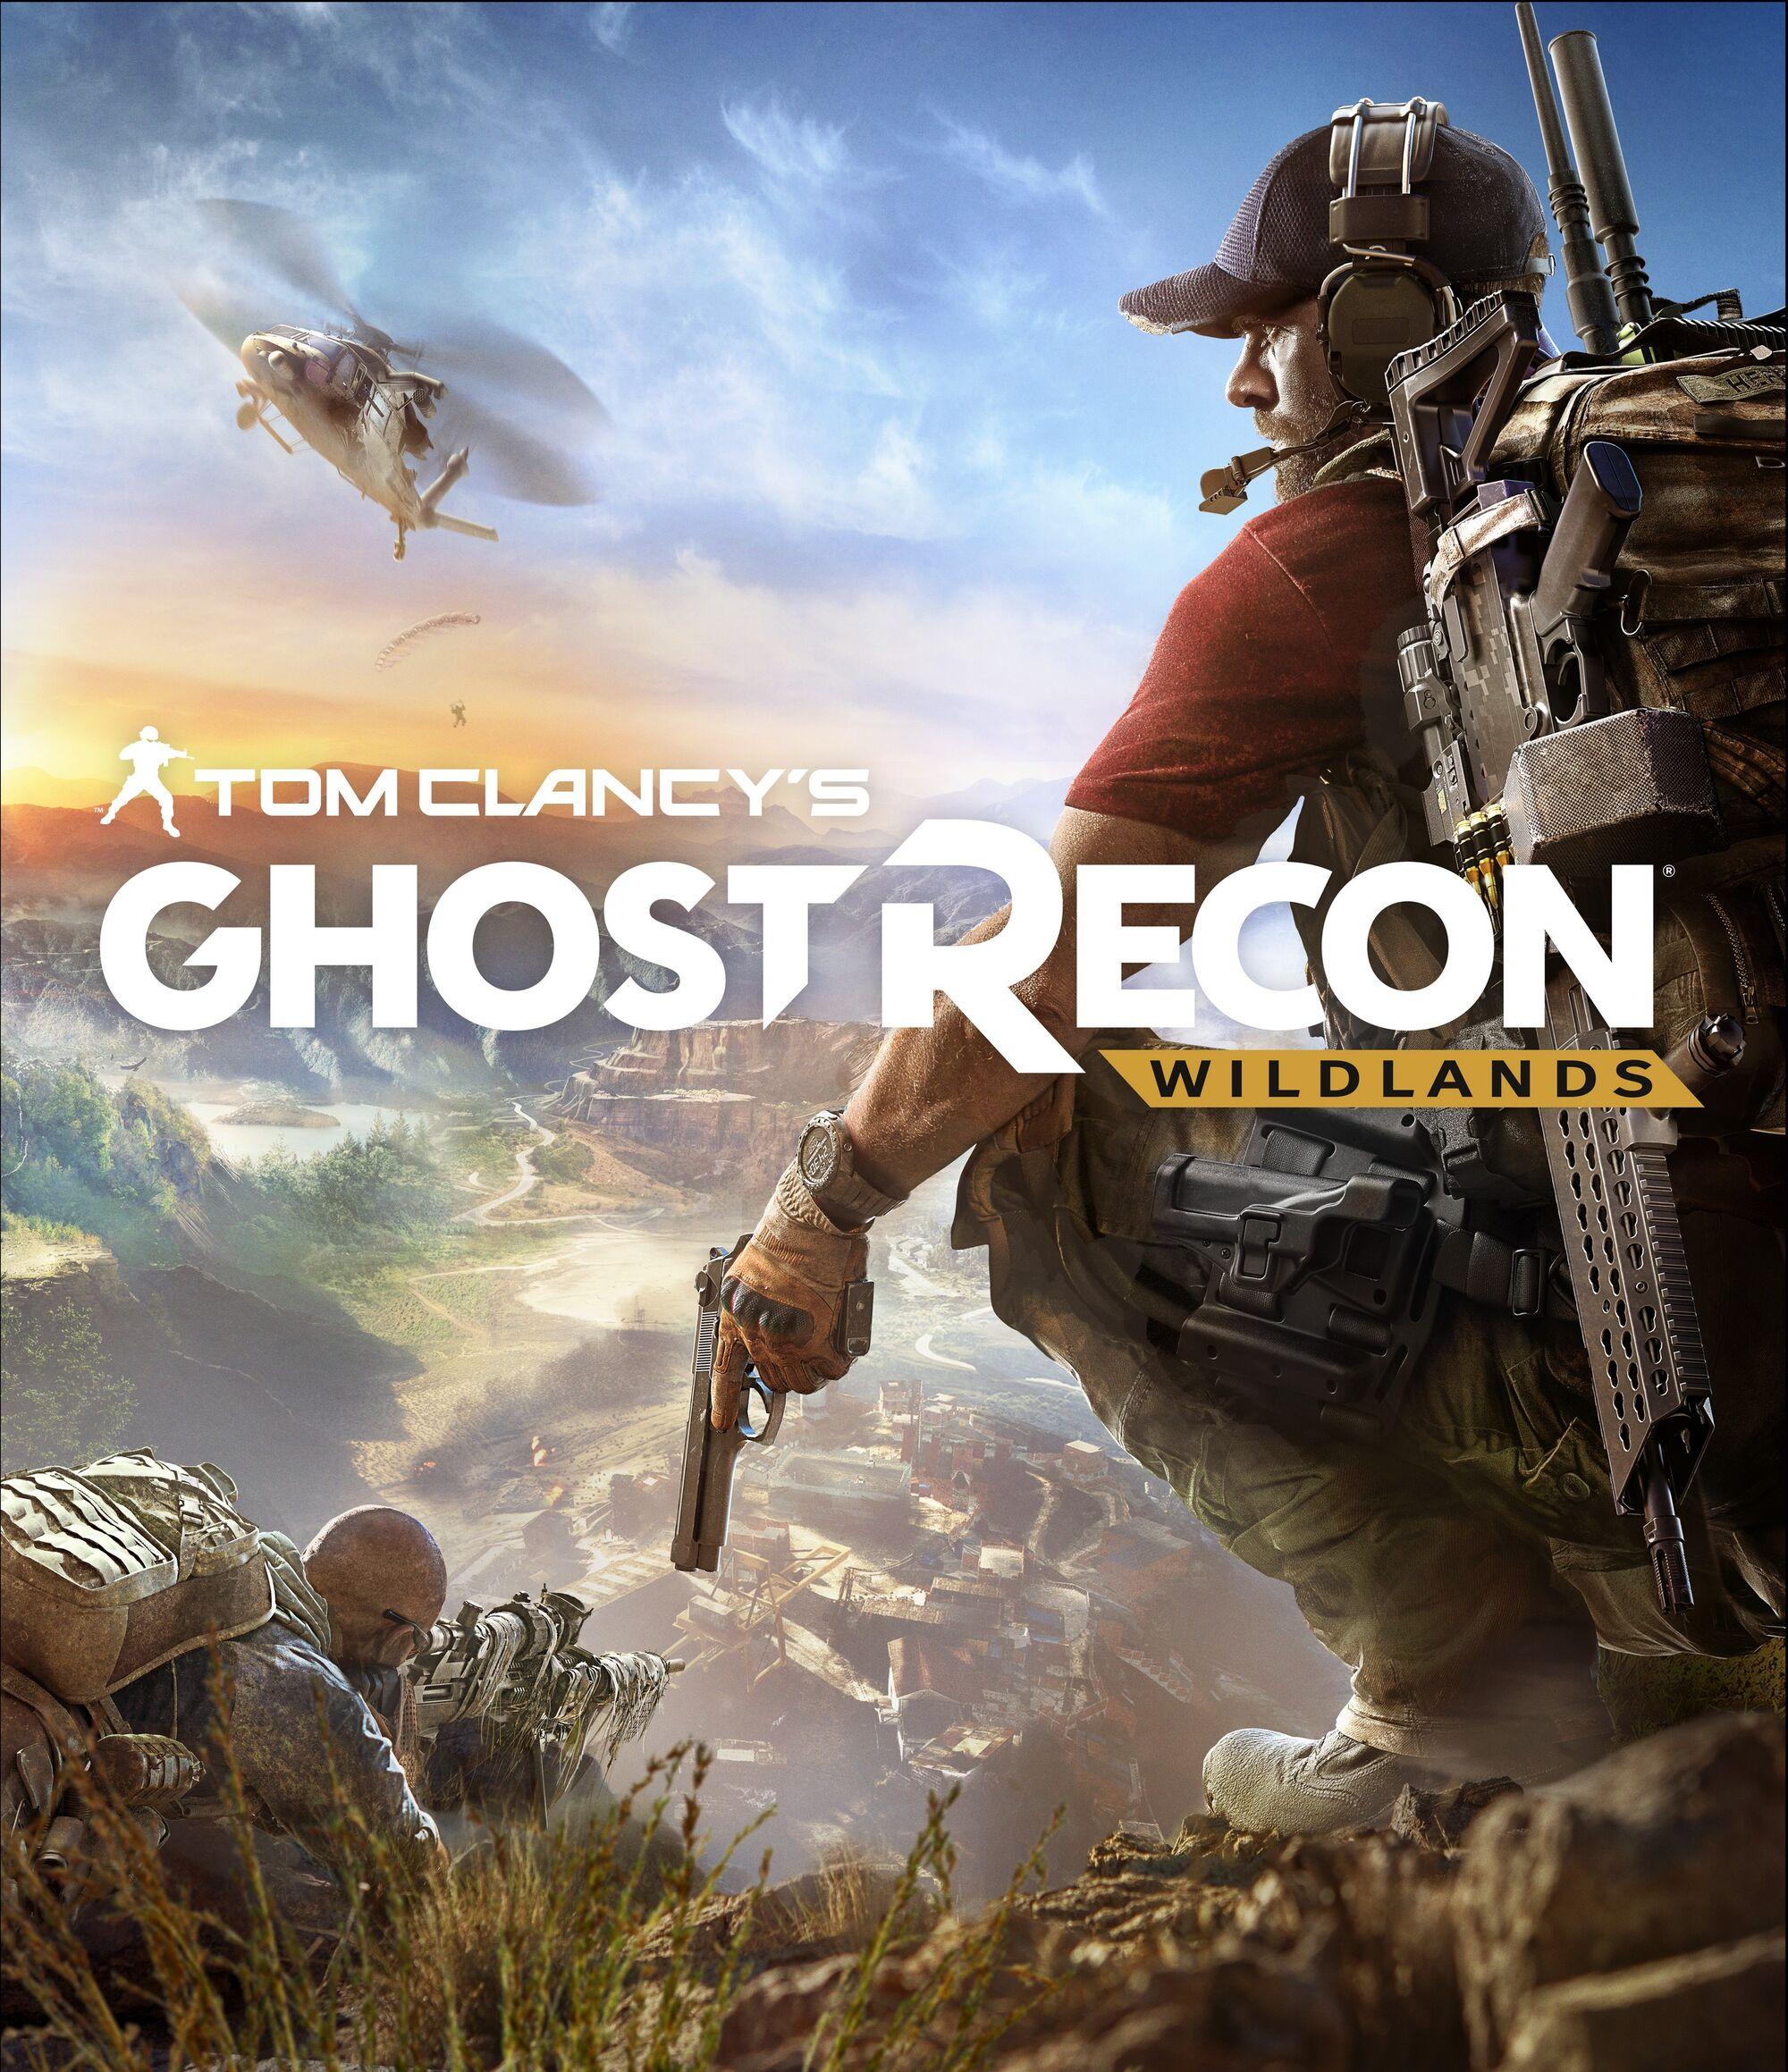 Tom Clancy's Ghost Recon Wildlands | Ghost Recon Wiki